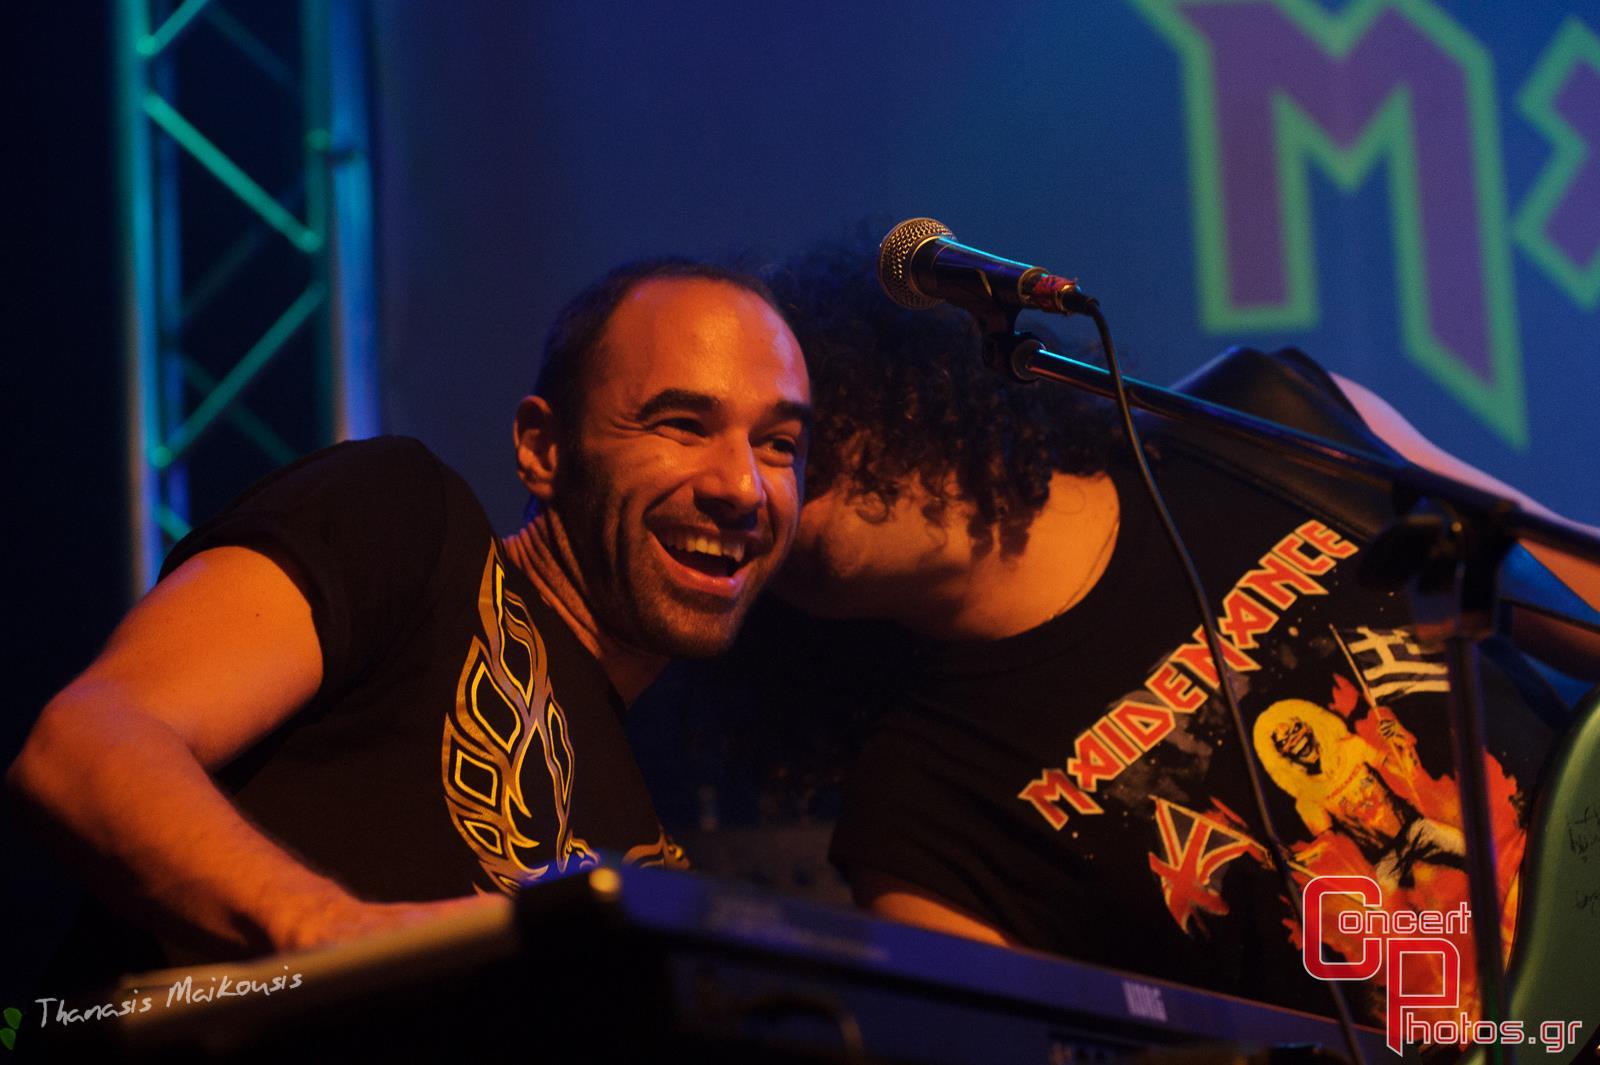 Paul Di Anno -Paul Di Anno  photographer:  - Thanasis_Maikousis (12 of 124)